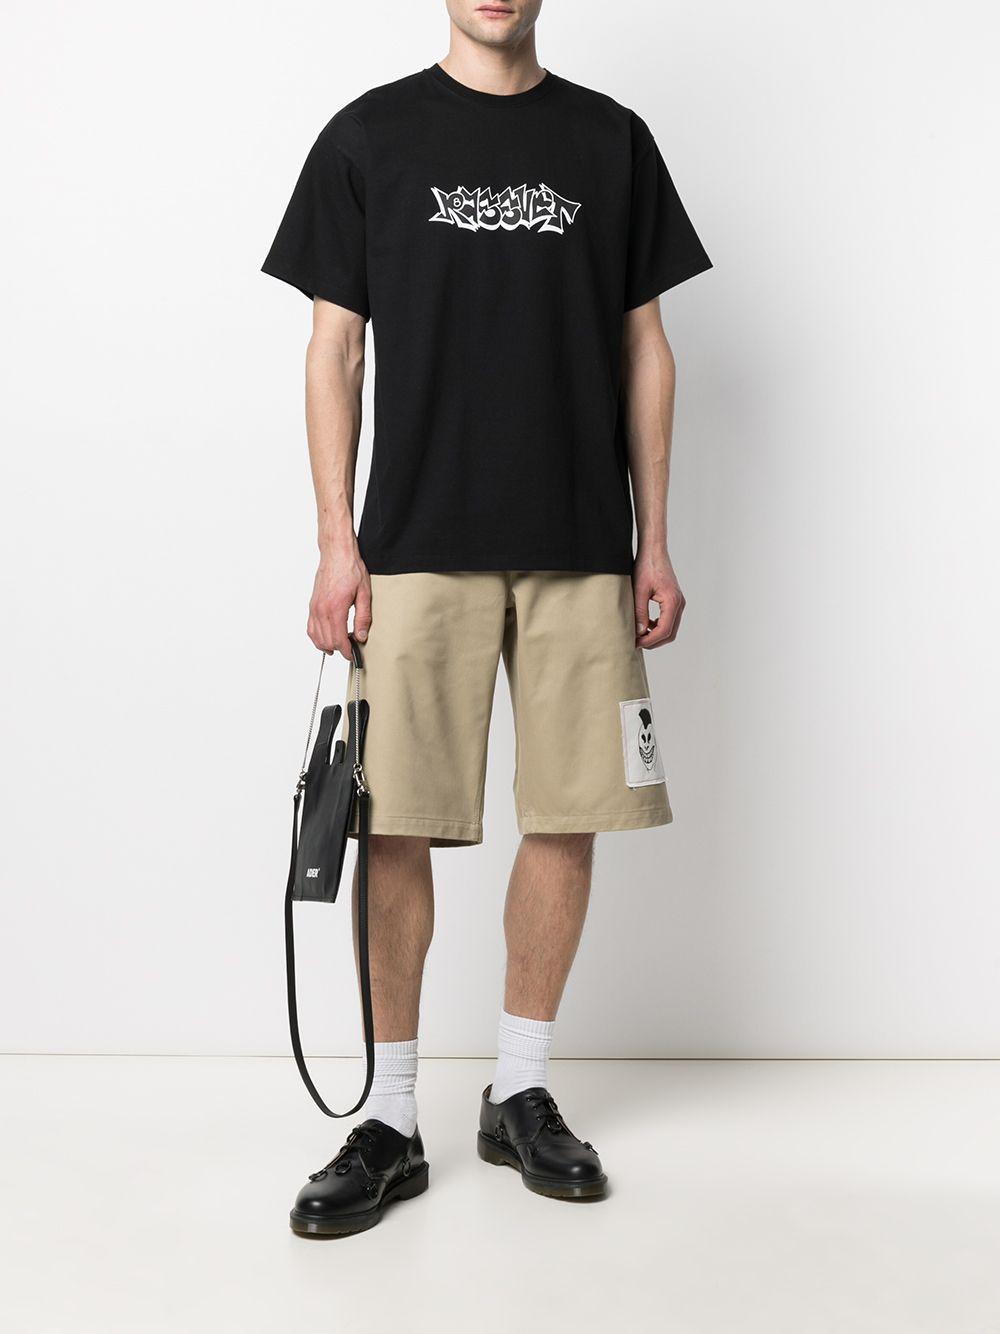 Rassvet t-shirt con stampa uomo RASSVET | T-shirt | PACC8T005BLACK